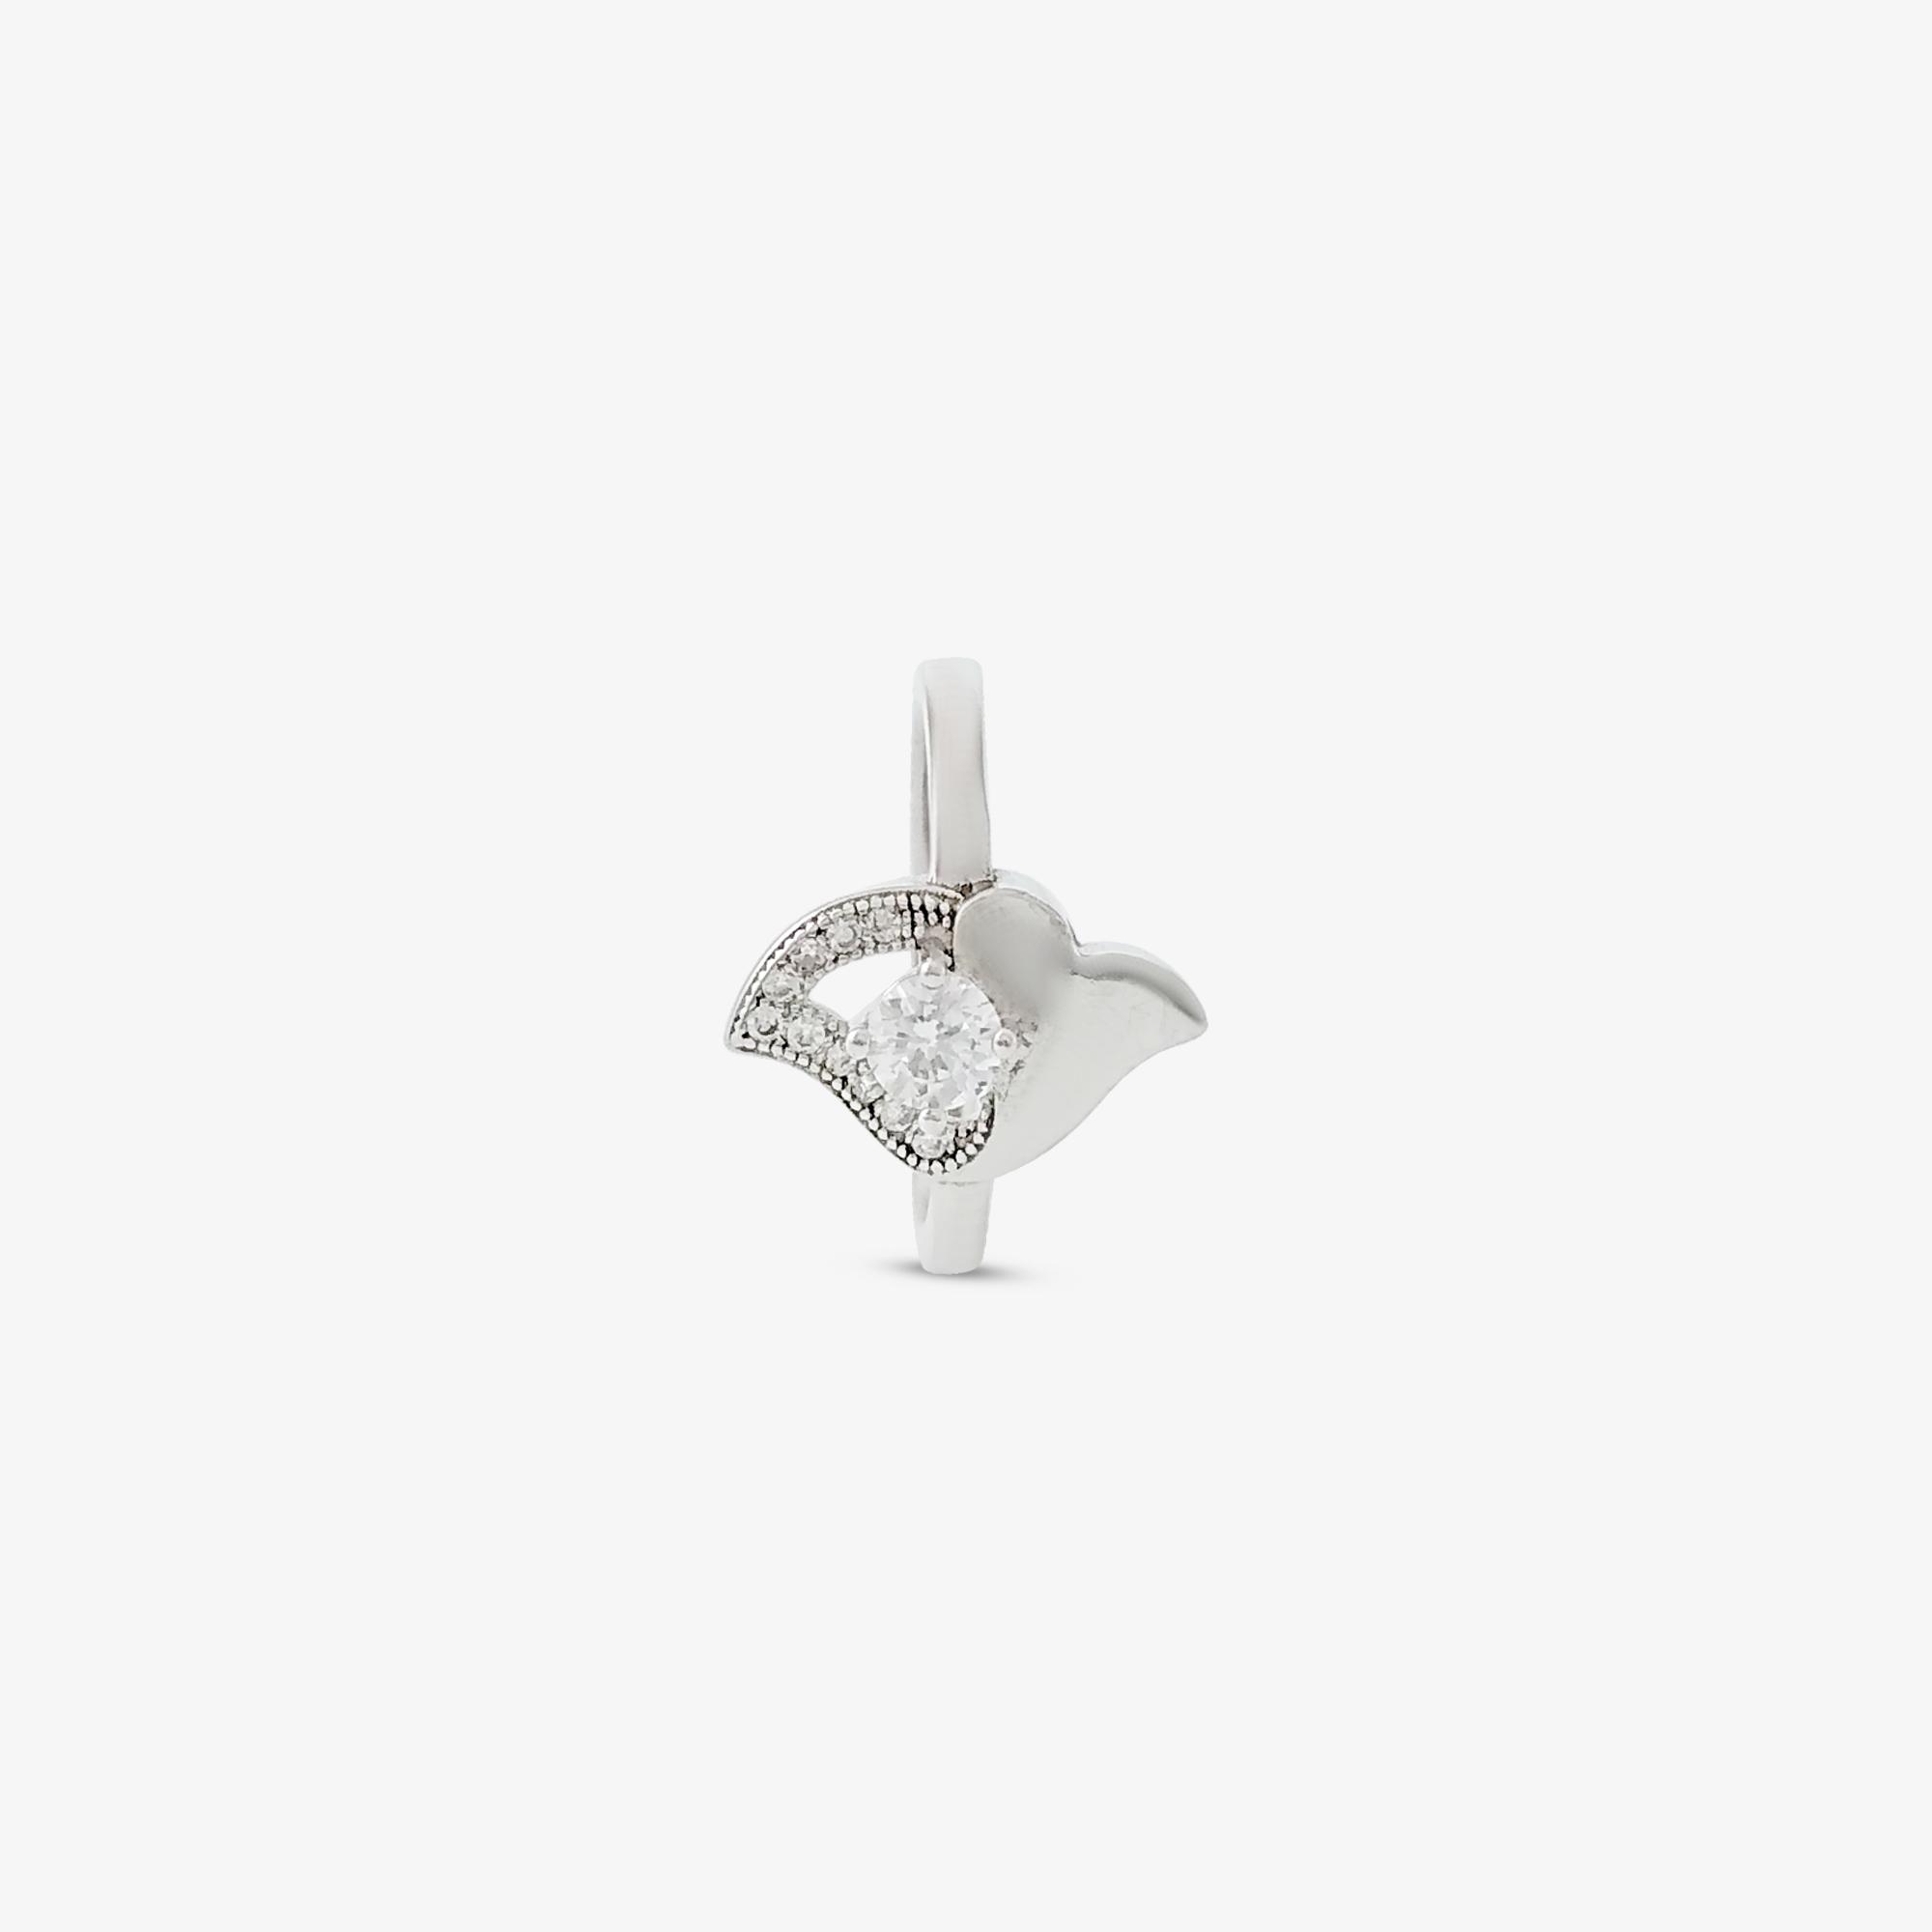 Stunning Silver Ring